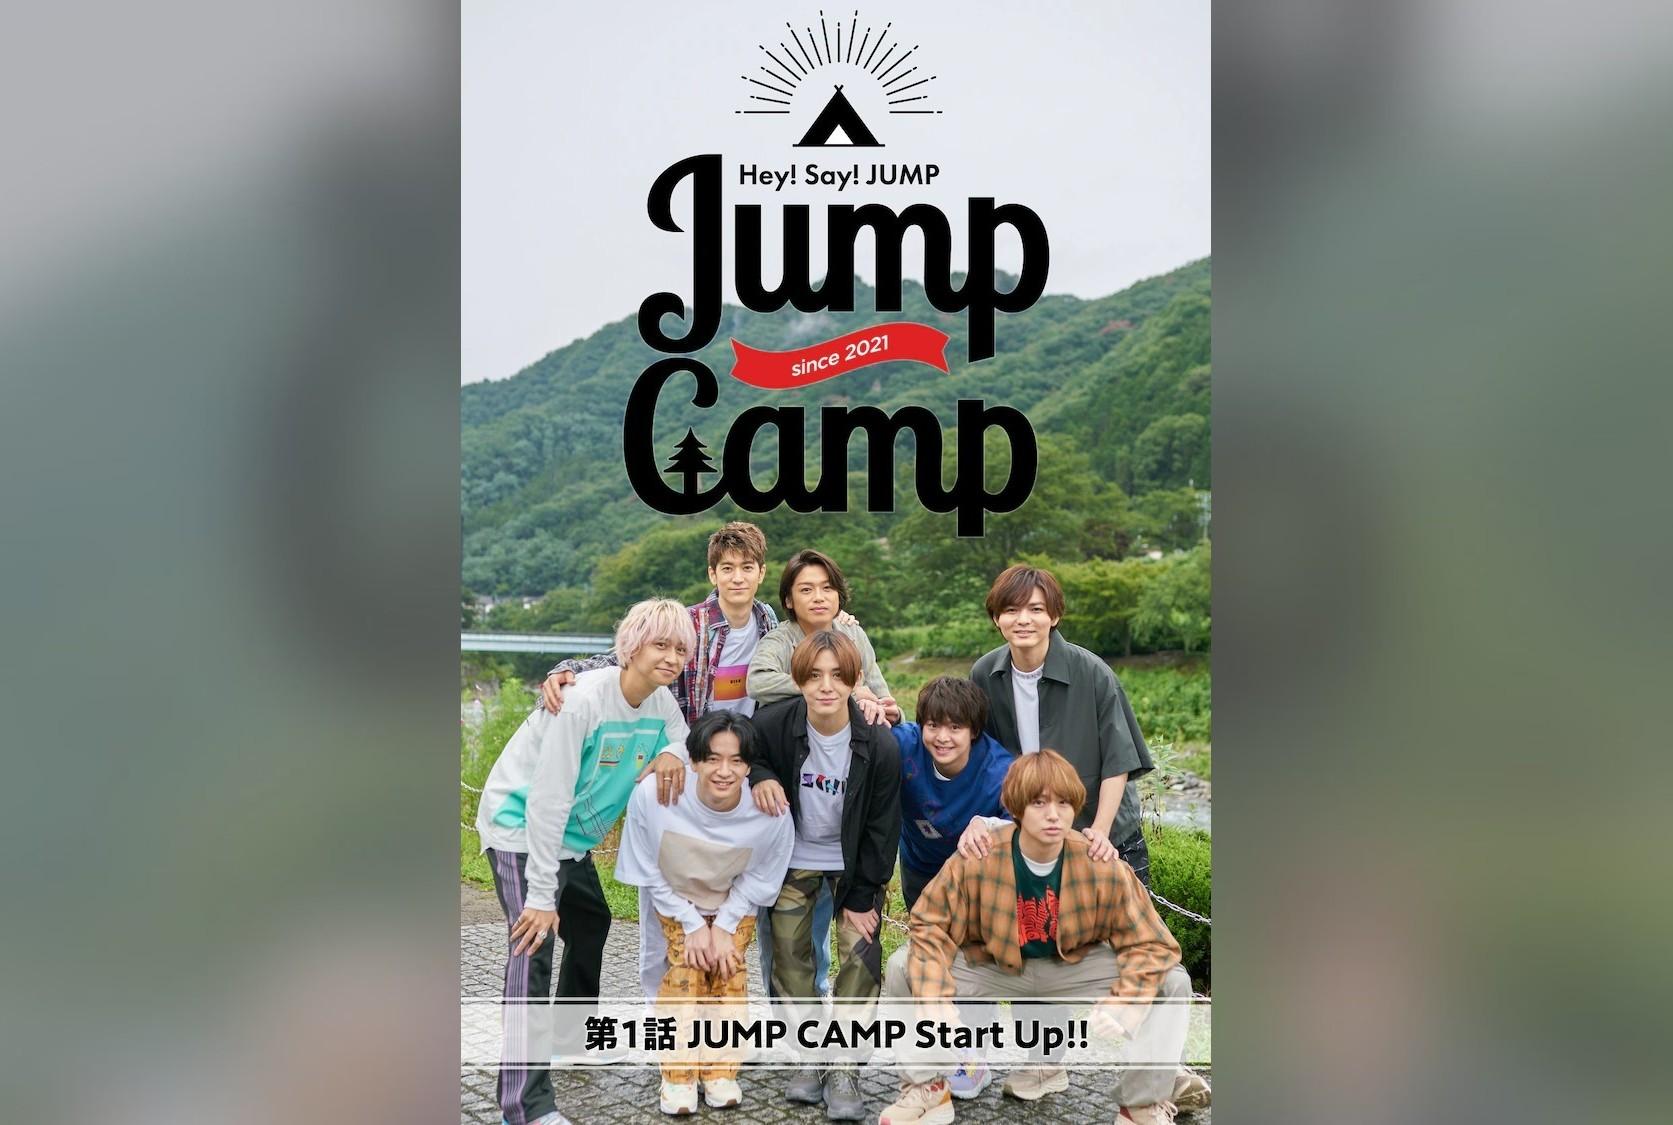 smash.新企劃!和Hey! Say! JUMP一起享受露營的氛圍